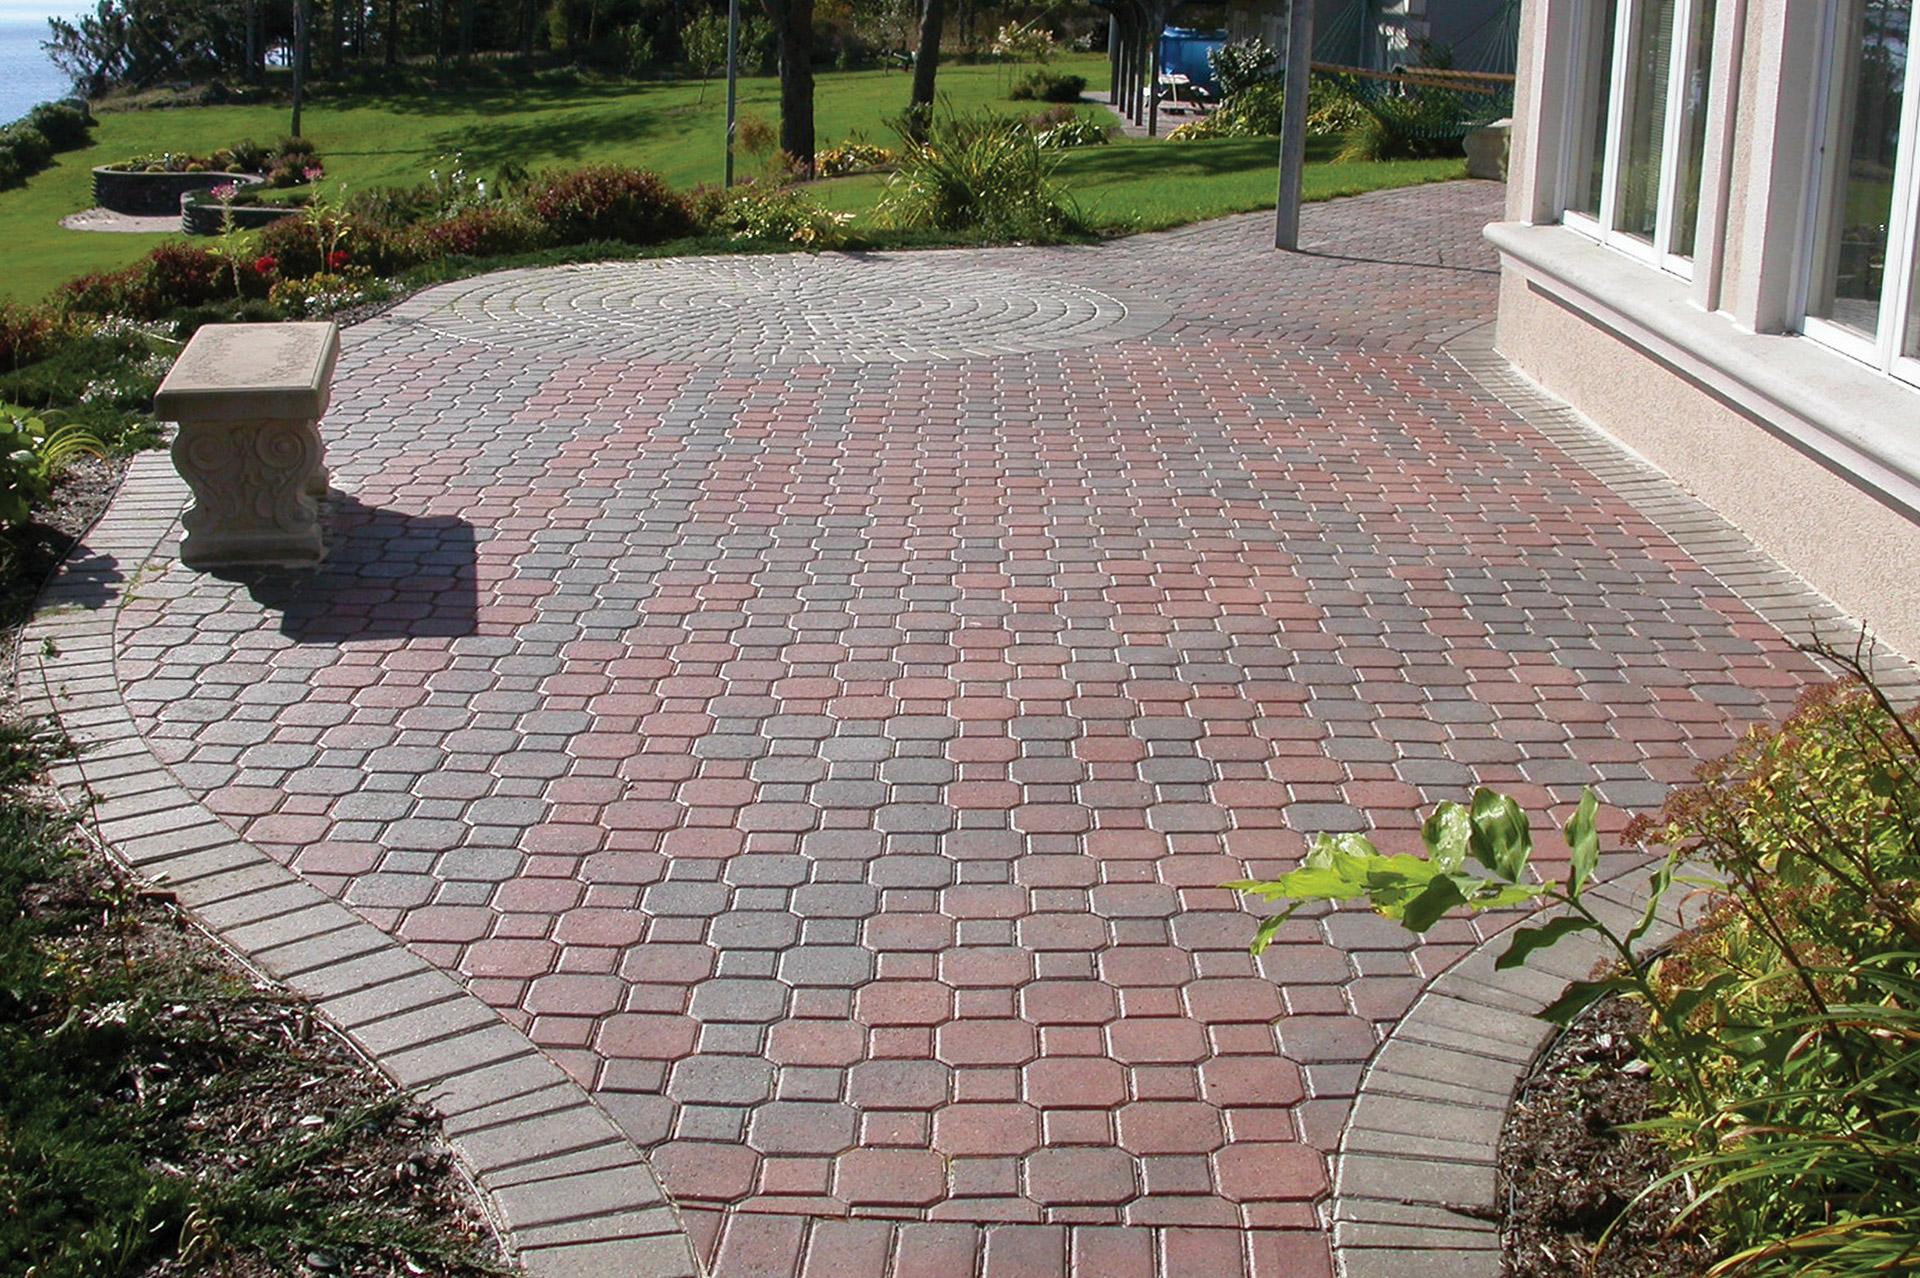 interlocking pavers for home driveways amp walkways - HD1920×1278